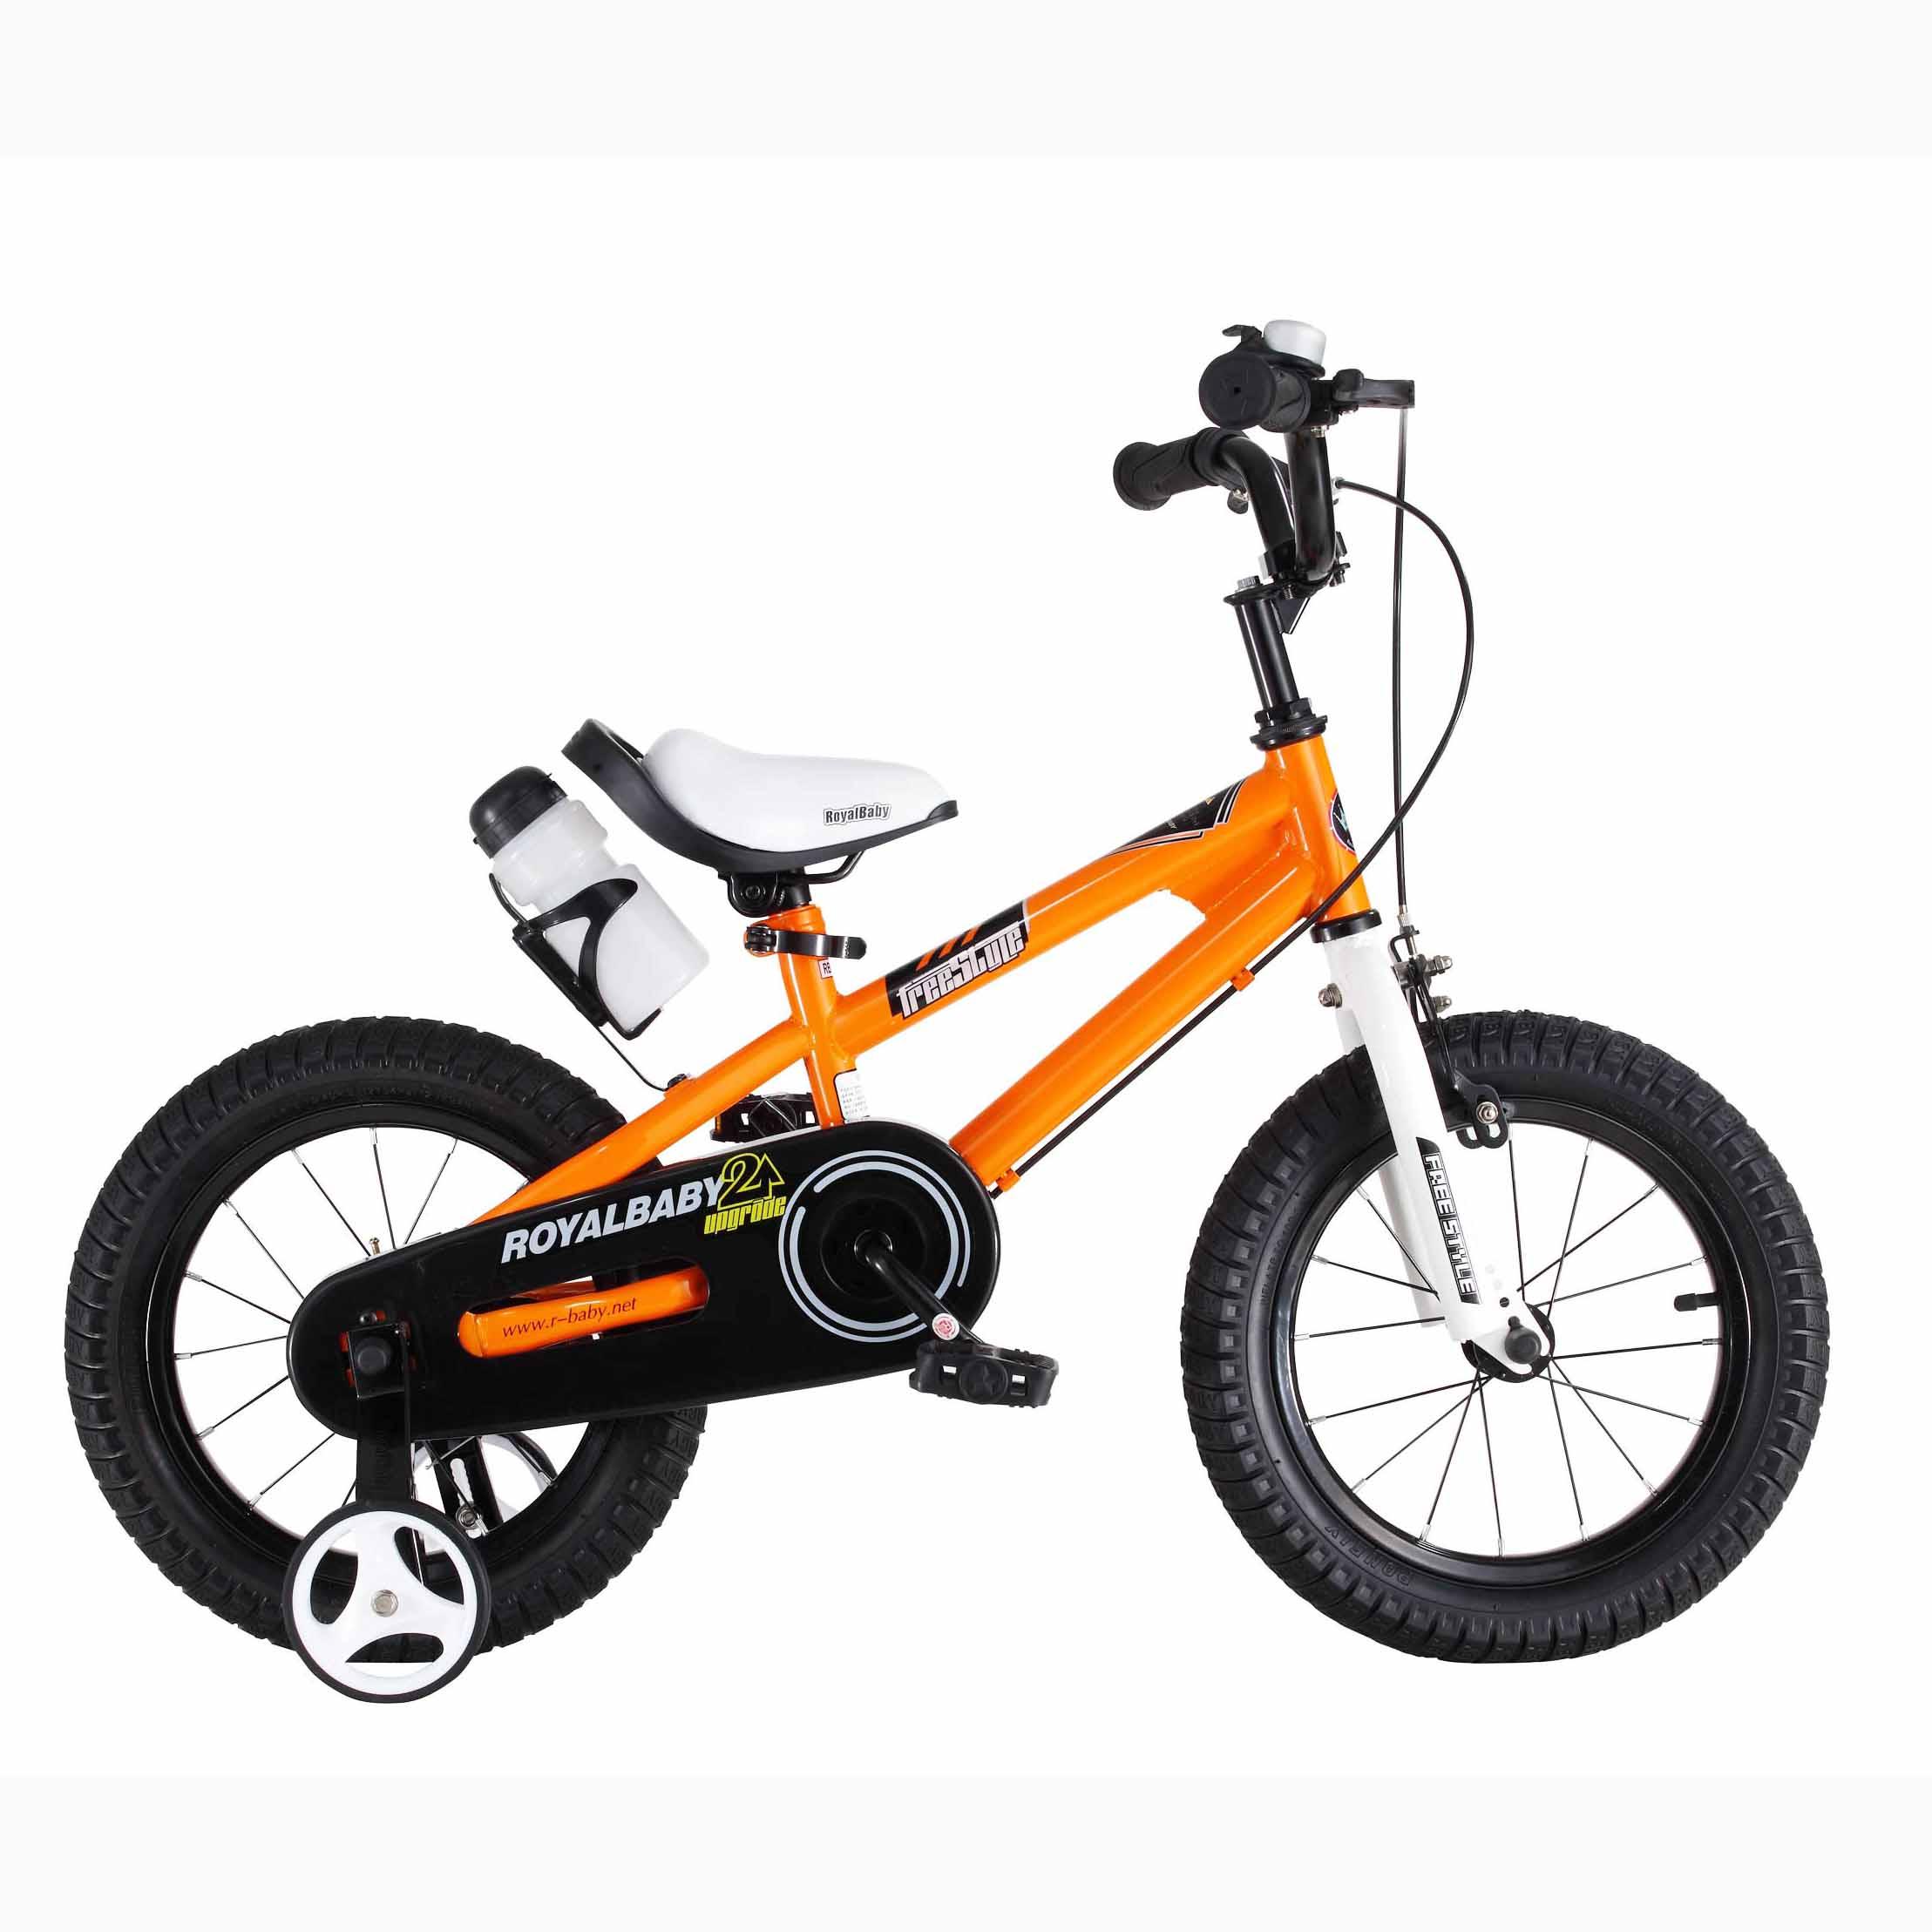 Фото Велосипед RoyalBaby FREESTYLE 16″, оранжевый